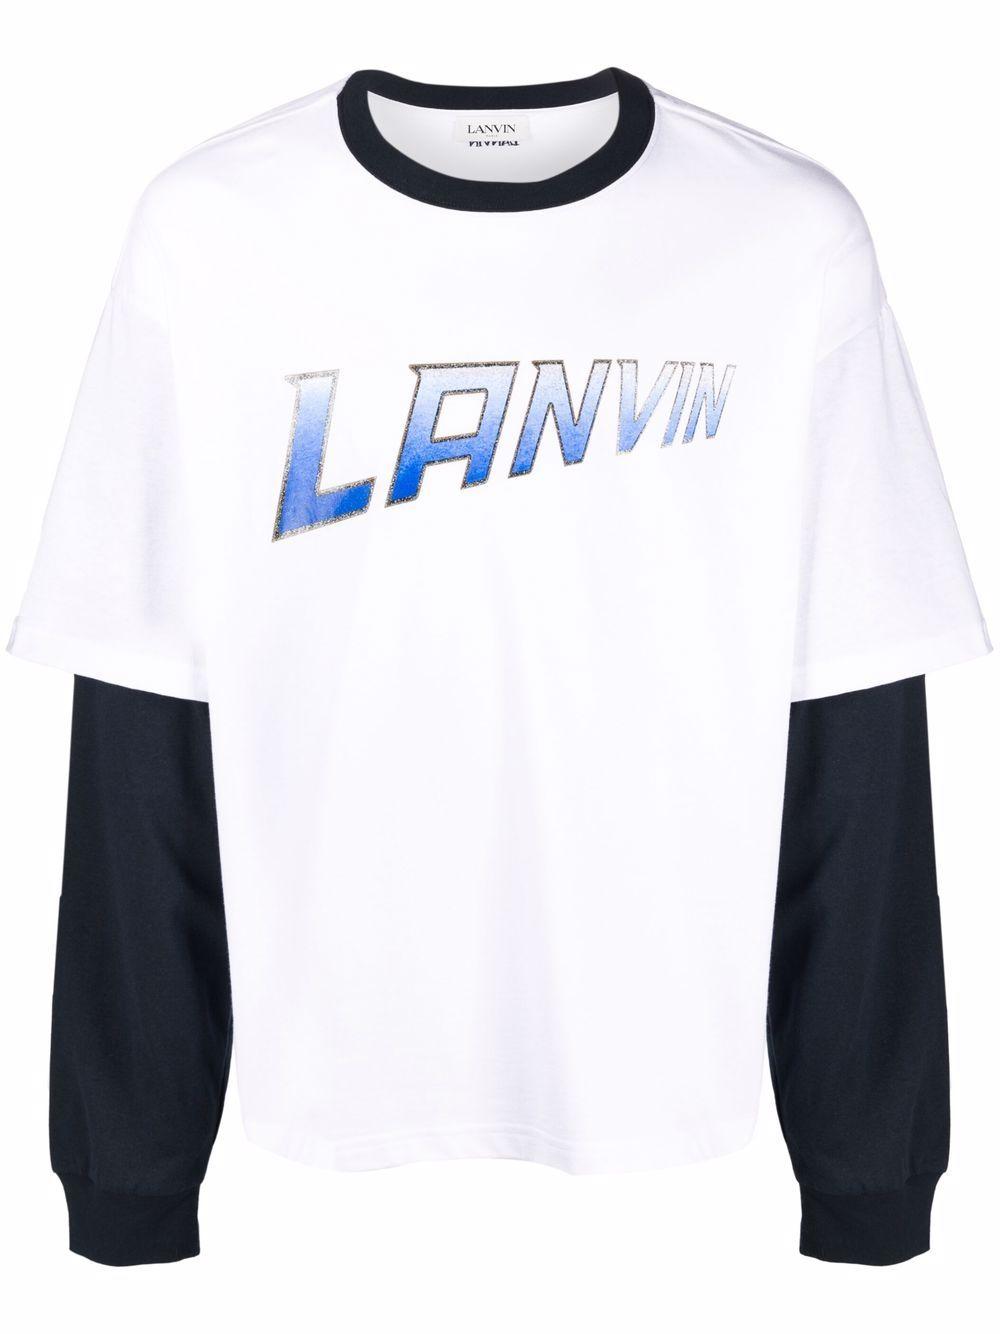 long sleeves t-shirt man white in cotton LANVIN   T-shirts   RM-TS0020-J054-A2101